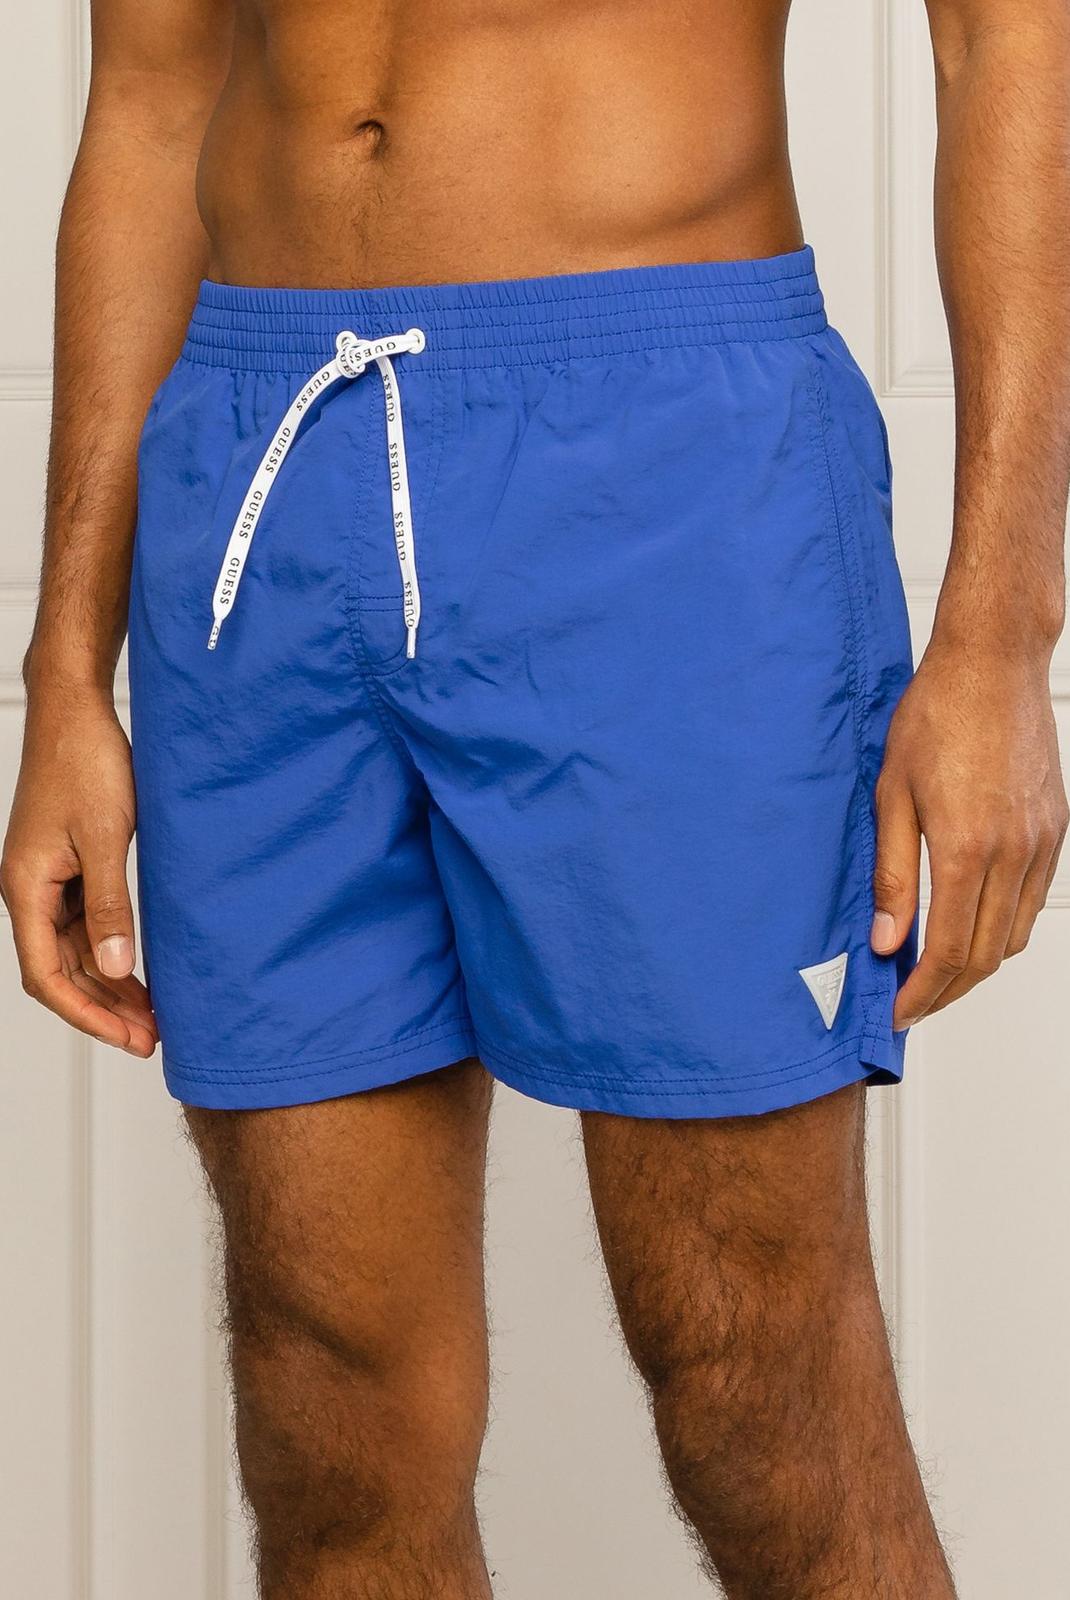 Shorts de bain  Guess jeans F02T00 TEL27 G7R4 BRIGHT ZAFFRE